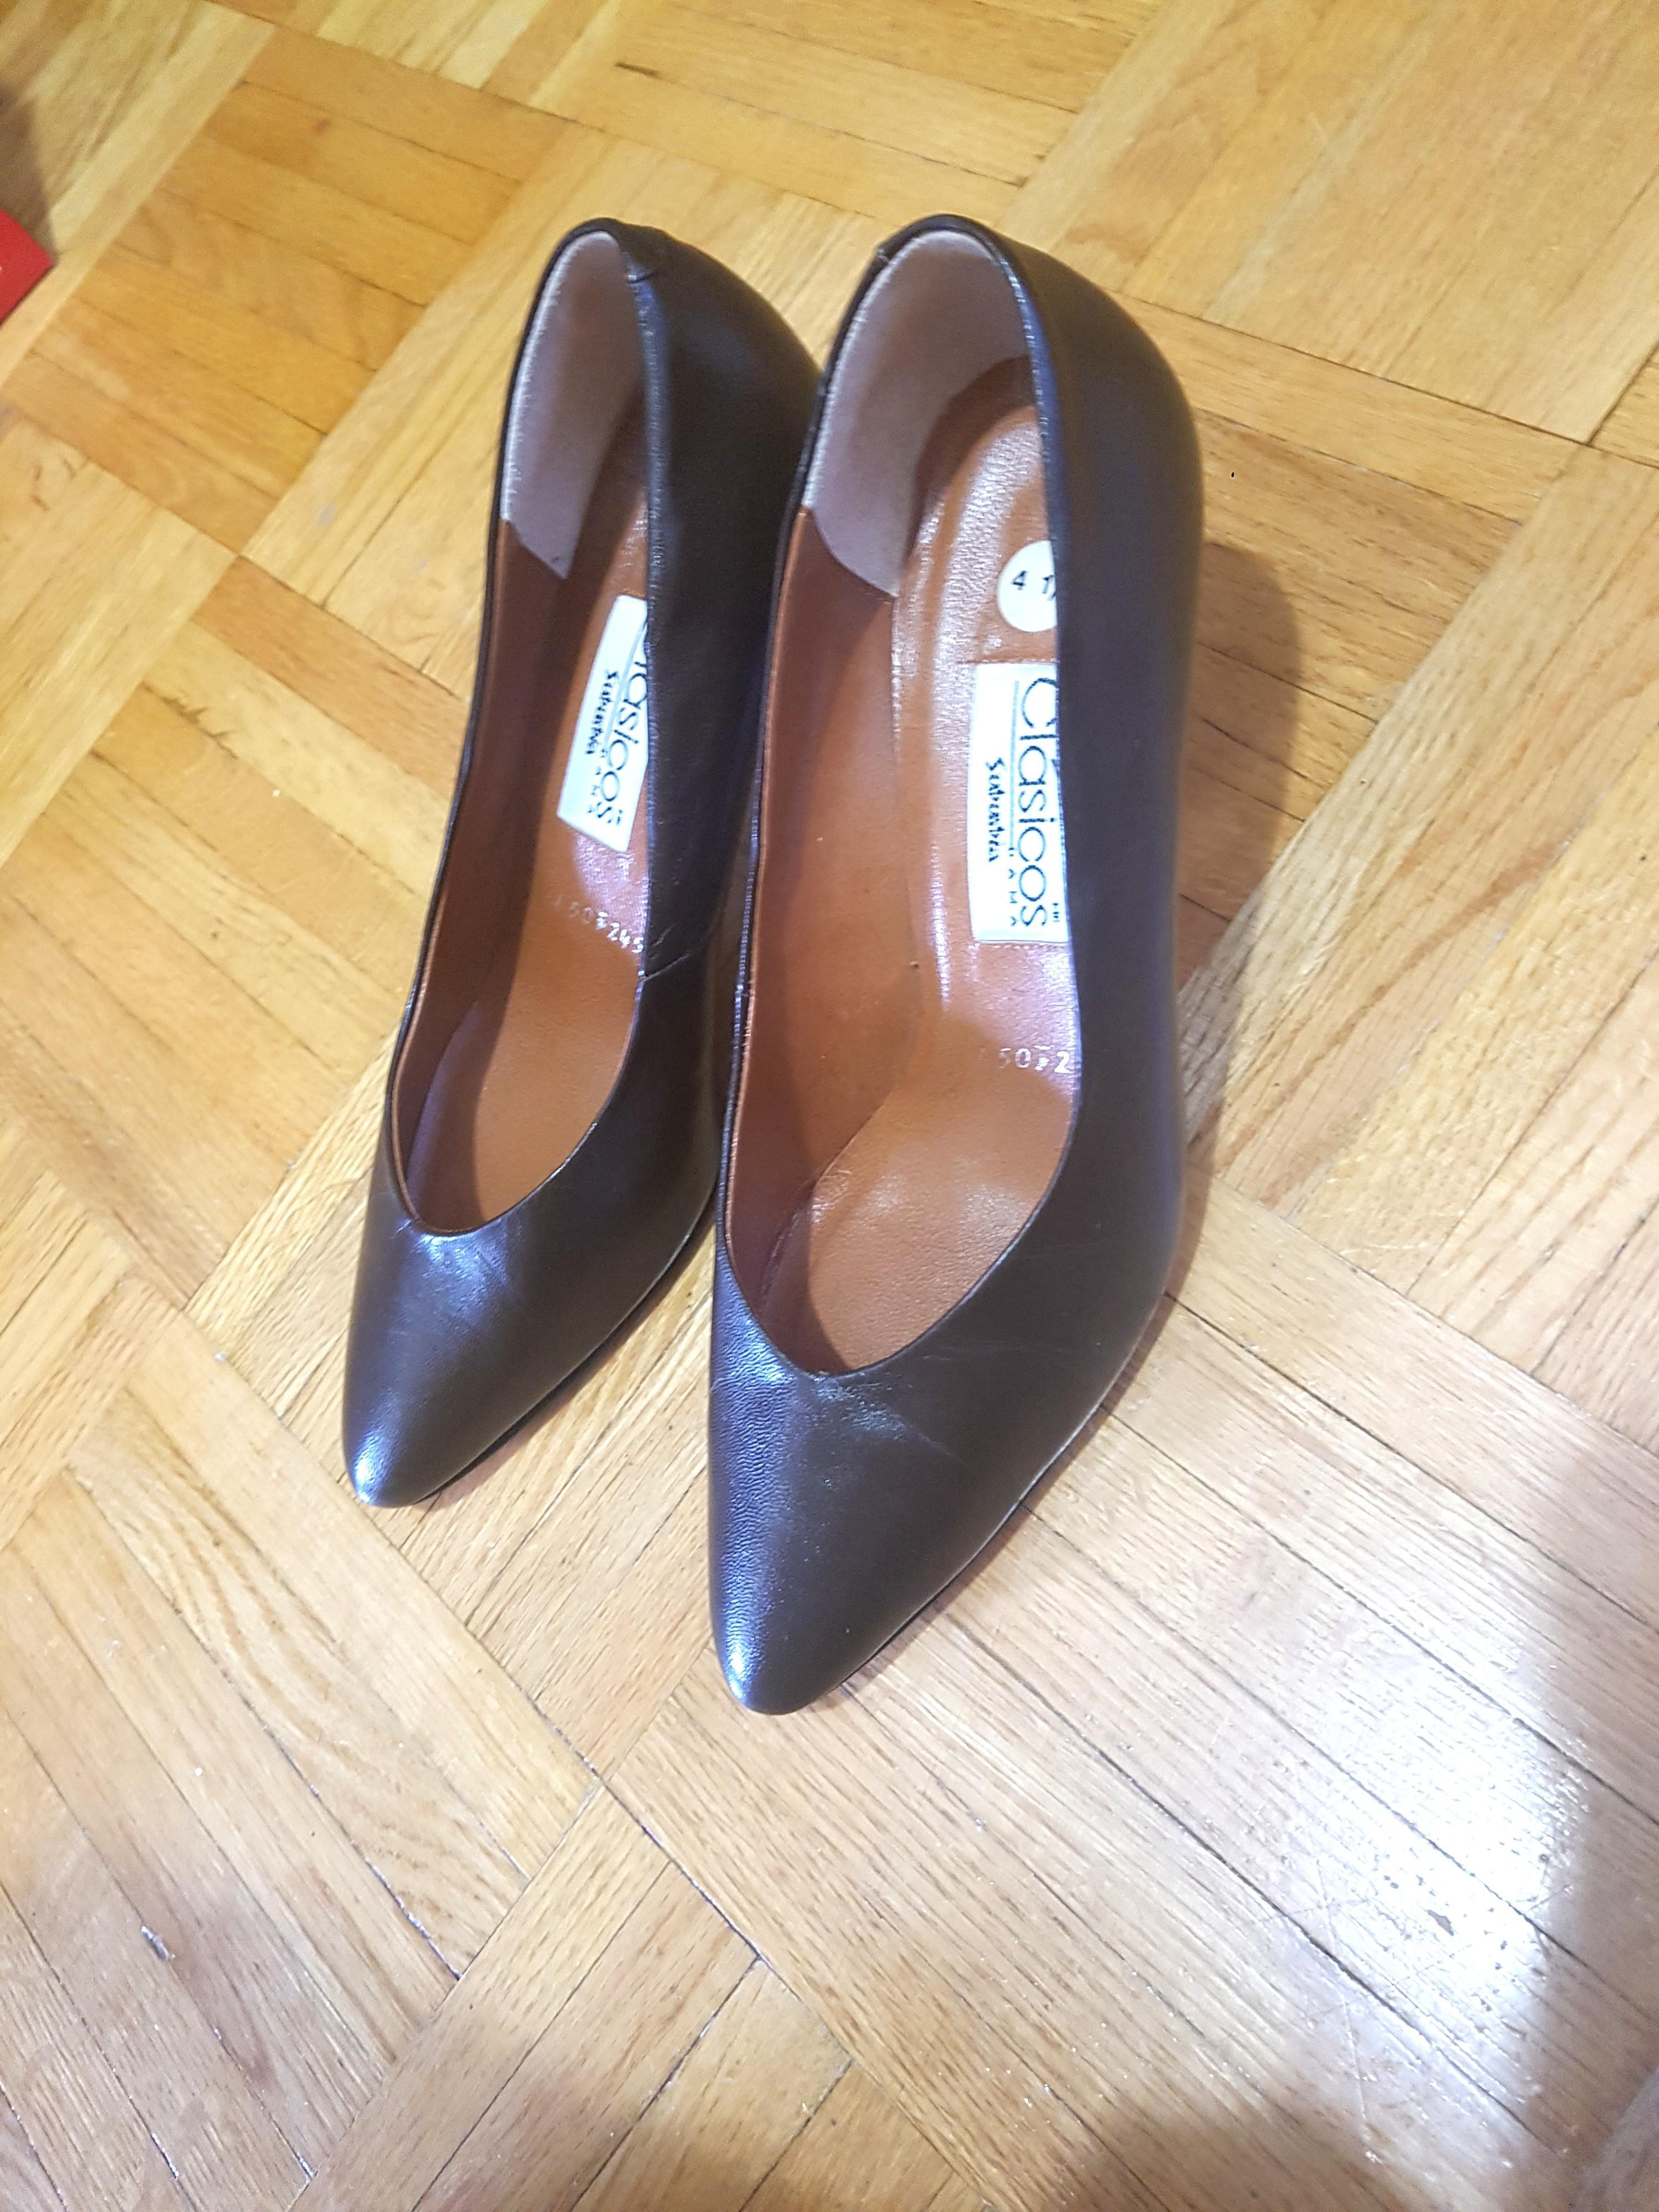 Leather pumps / heels